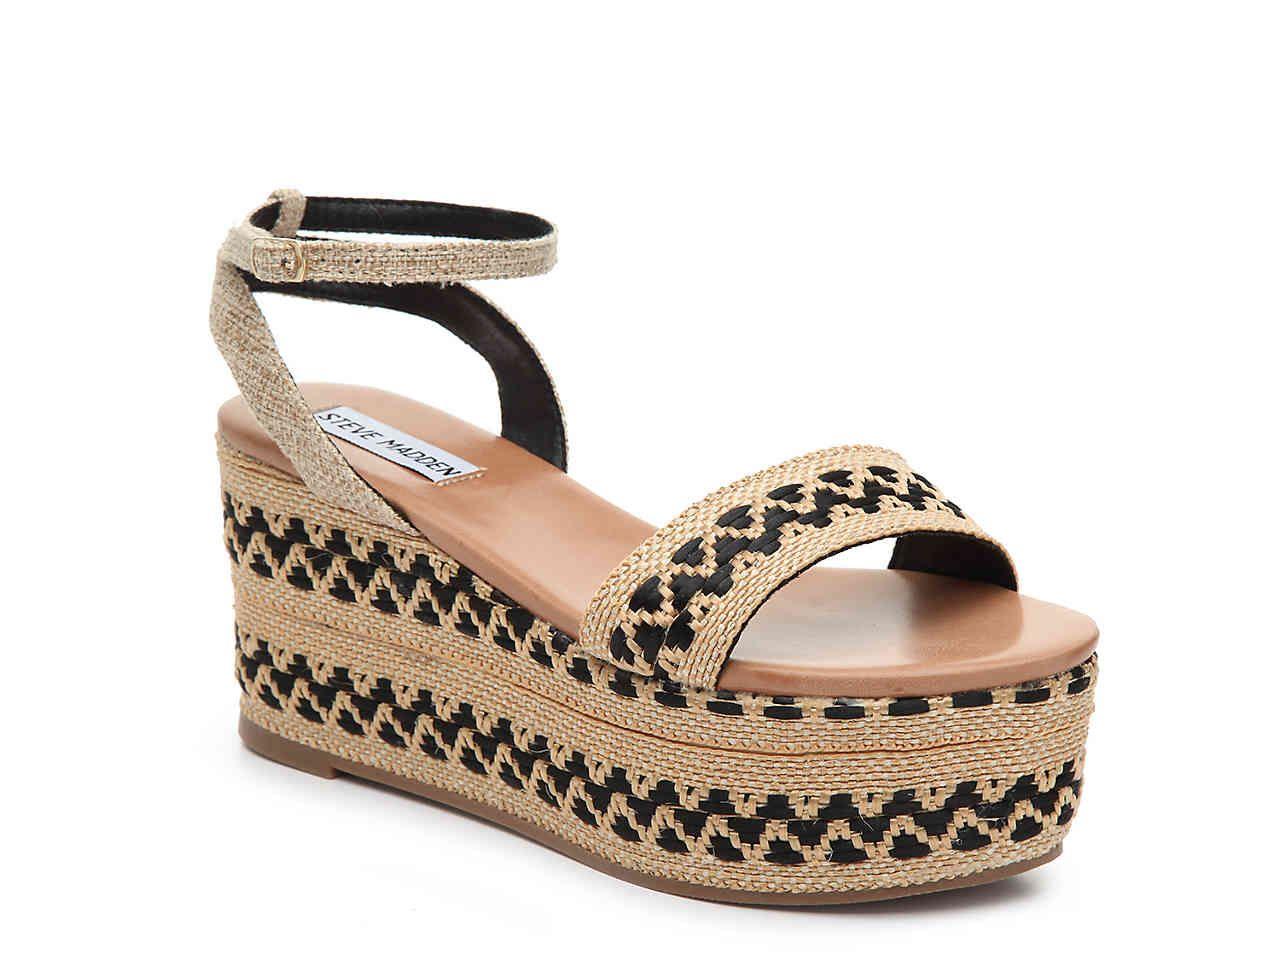 43+ Wedding wedge sandals canada info